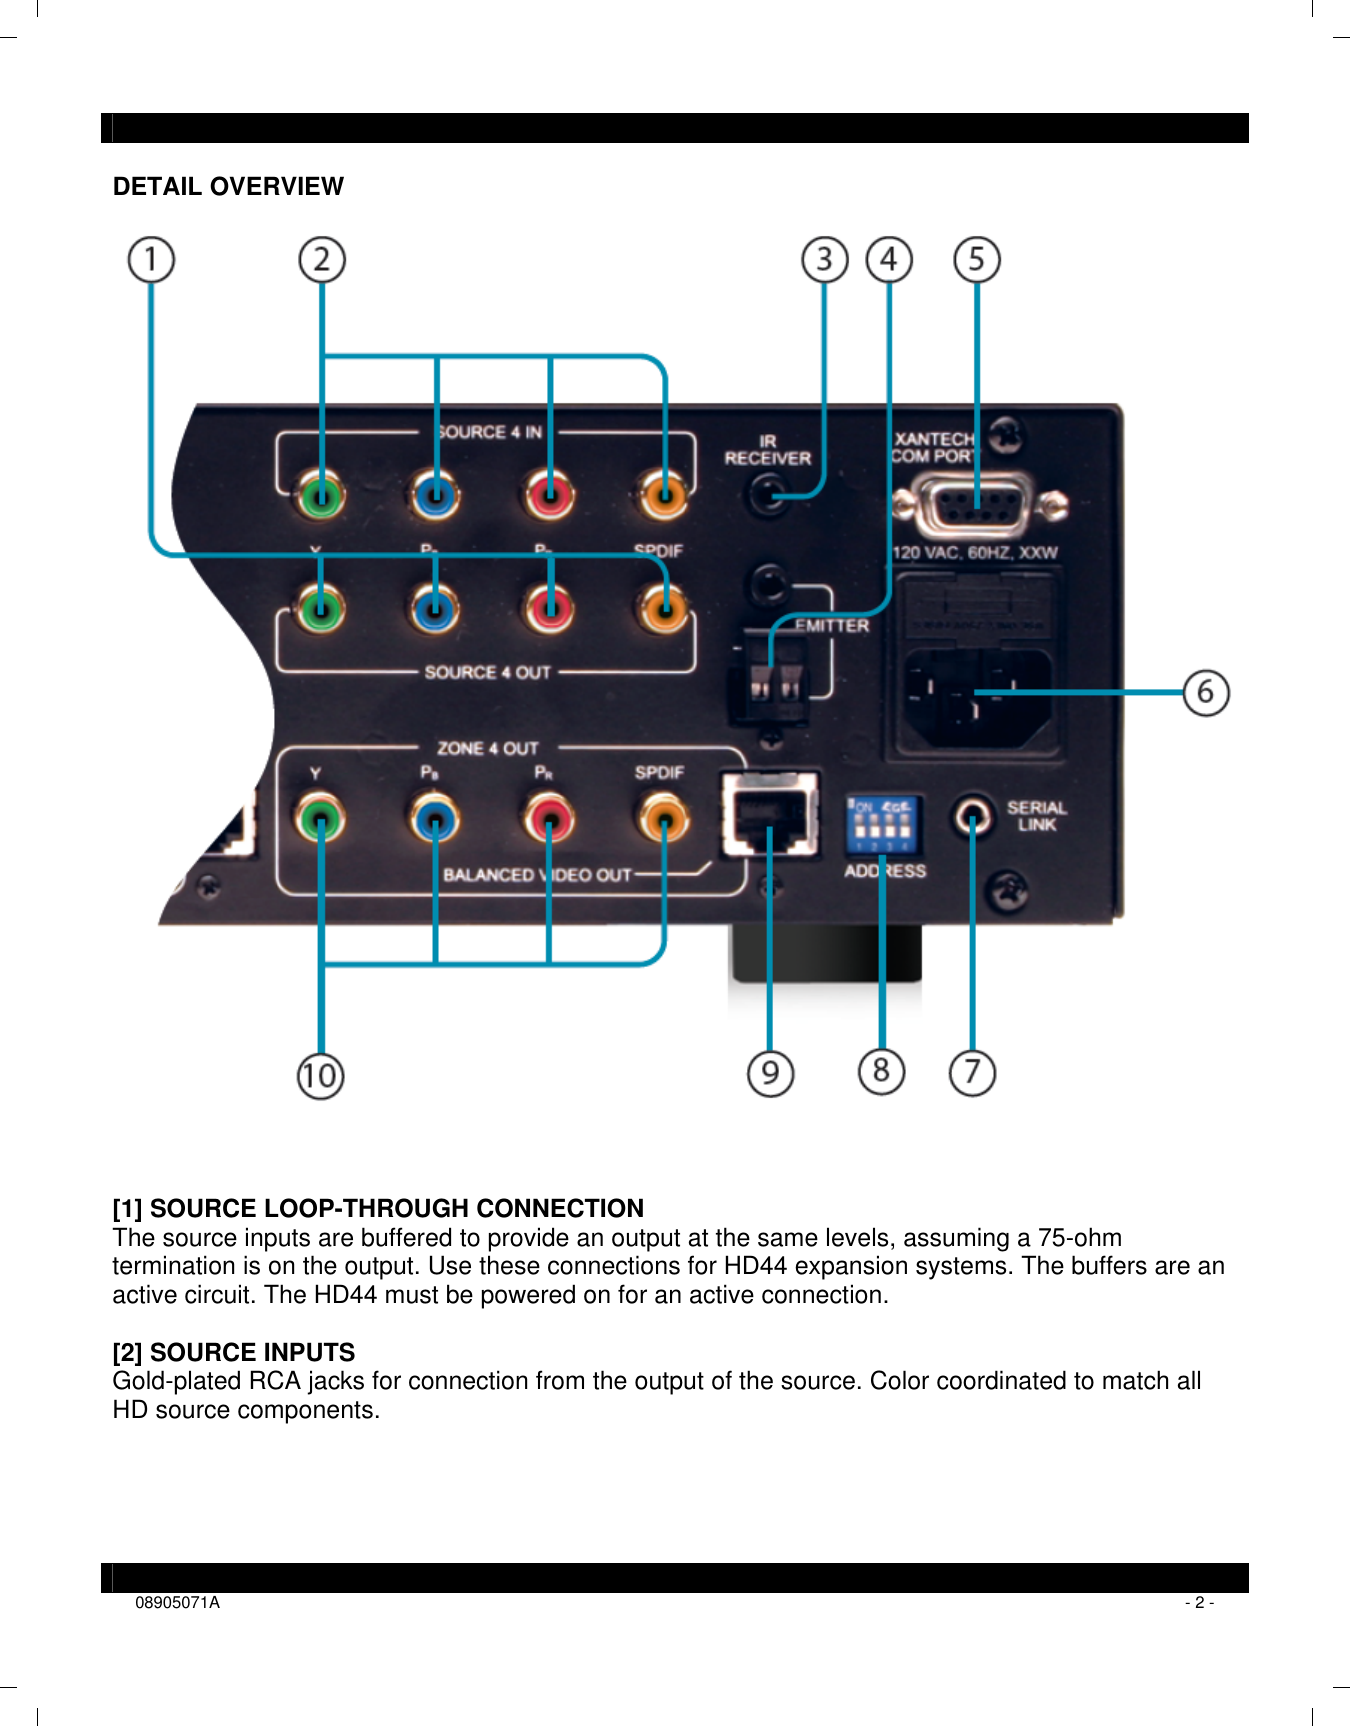 xantech switch hd44c users manual installation instructions  page 2 of 12 xantech xantech switch hd44c users manual